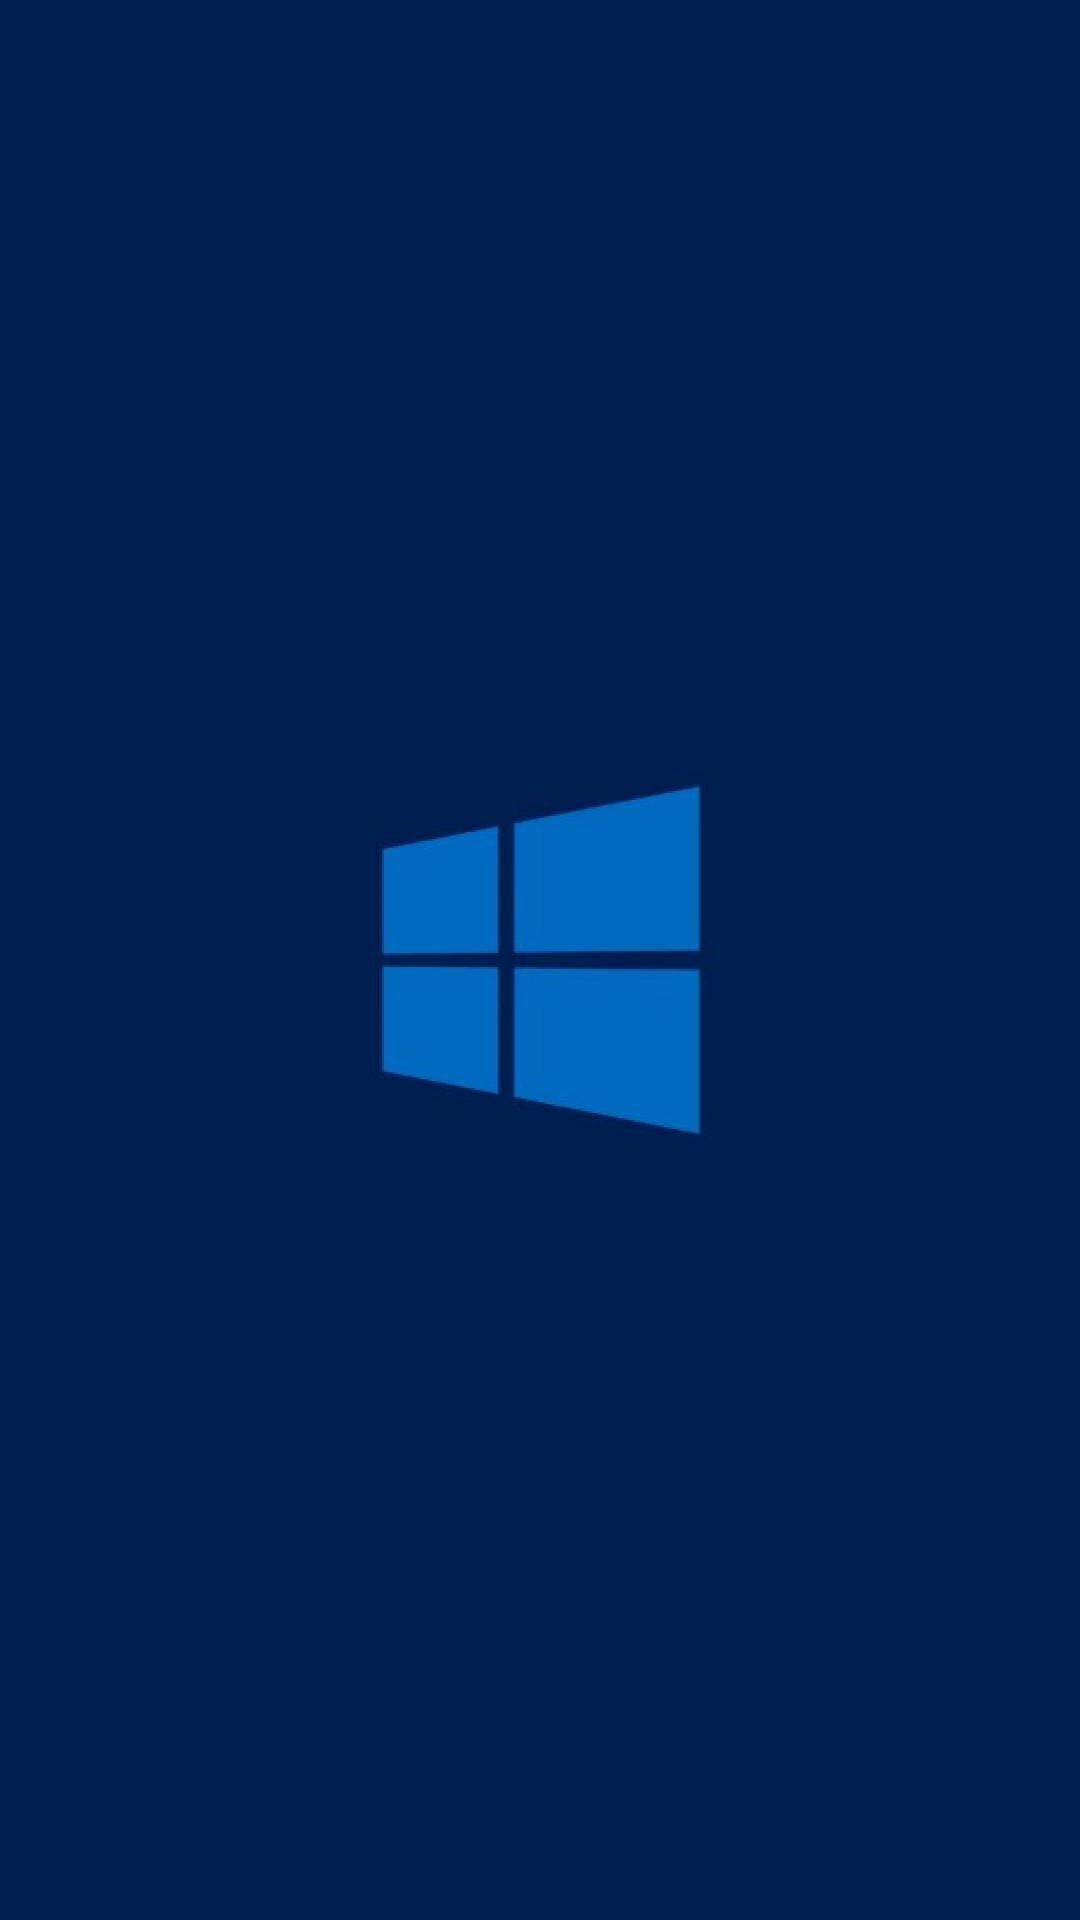 Windows 10 Wallpaper For Mobile Http Wallpapers Trestons Com 2015 12 24 Windows 10 Desktop Mobile Windows 10 Wallpaper For Mobi Windows 10 Windows Wallpaper